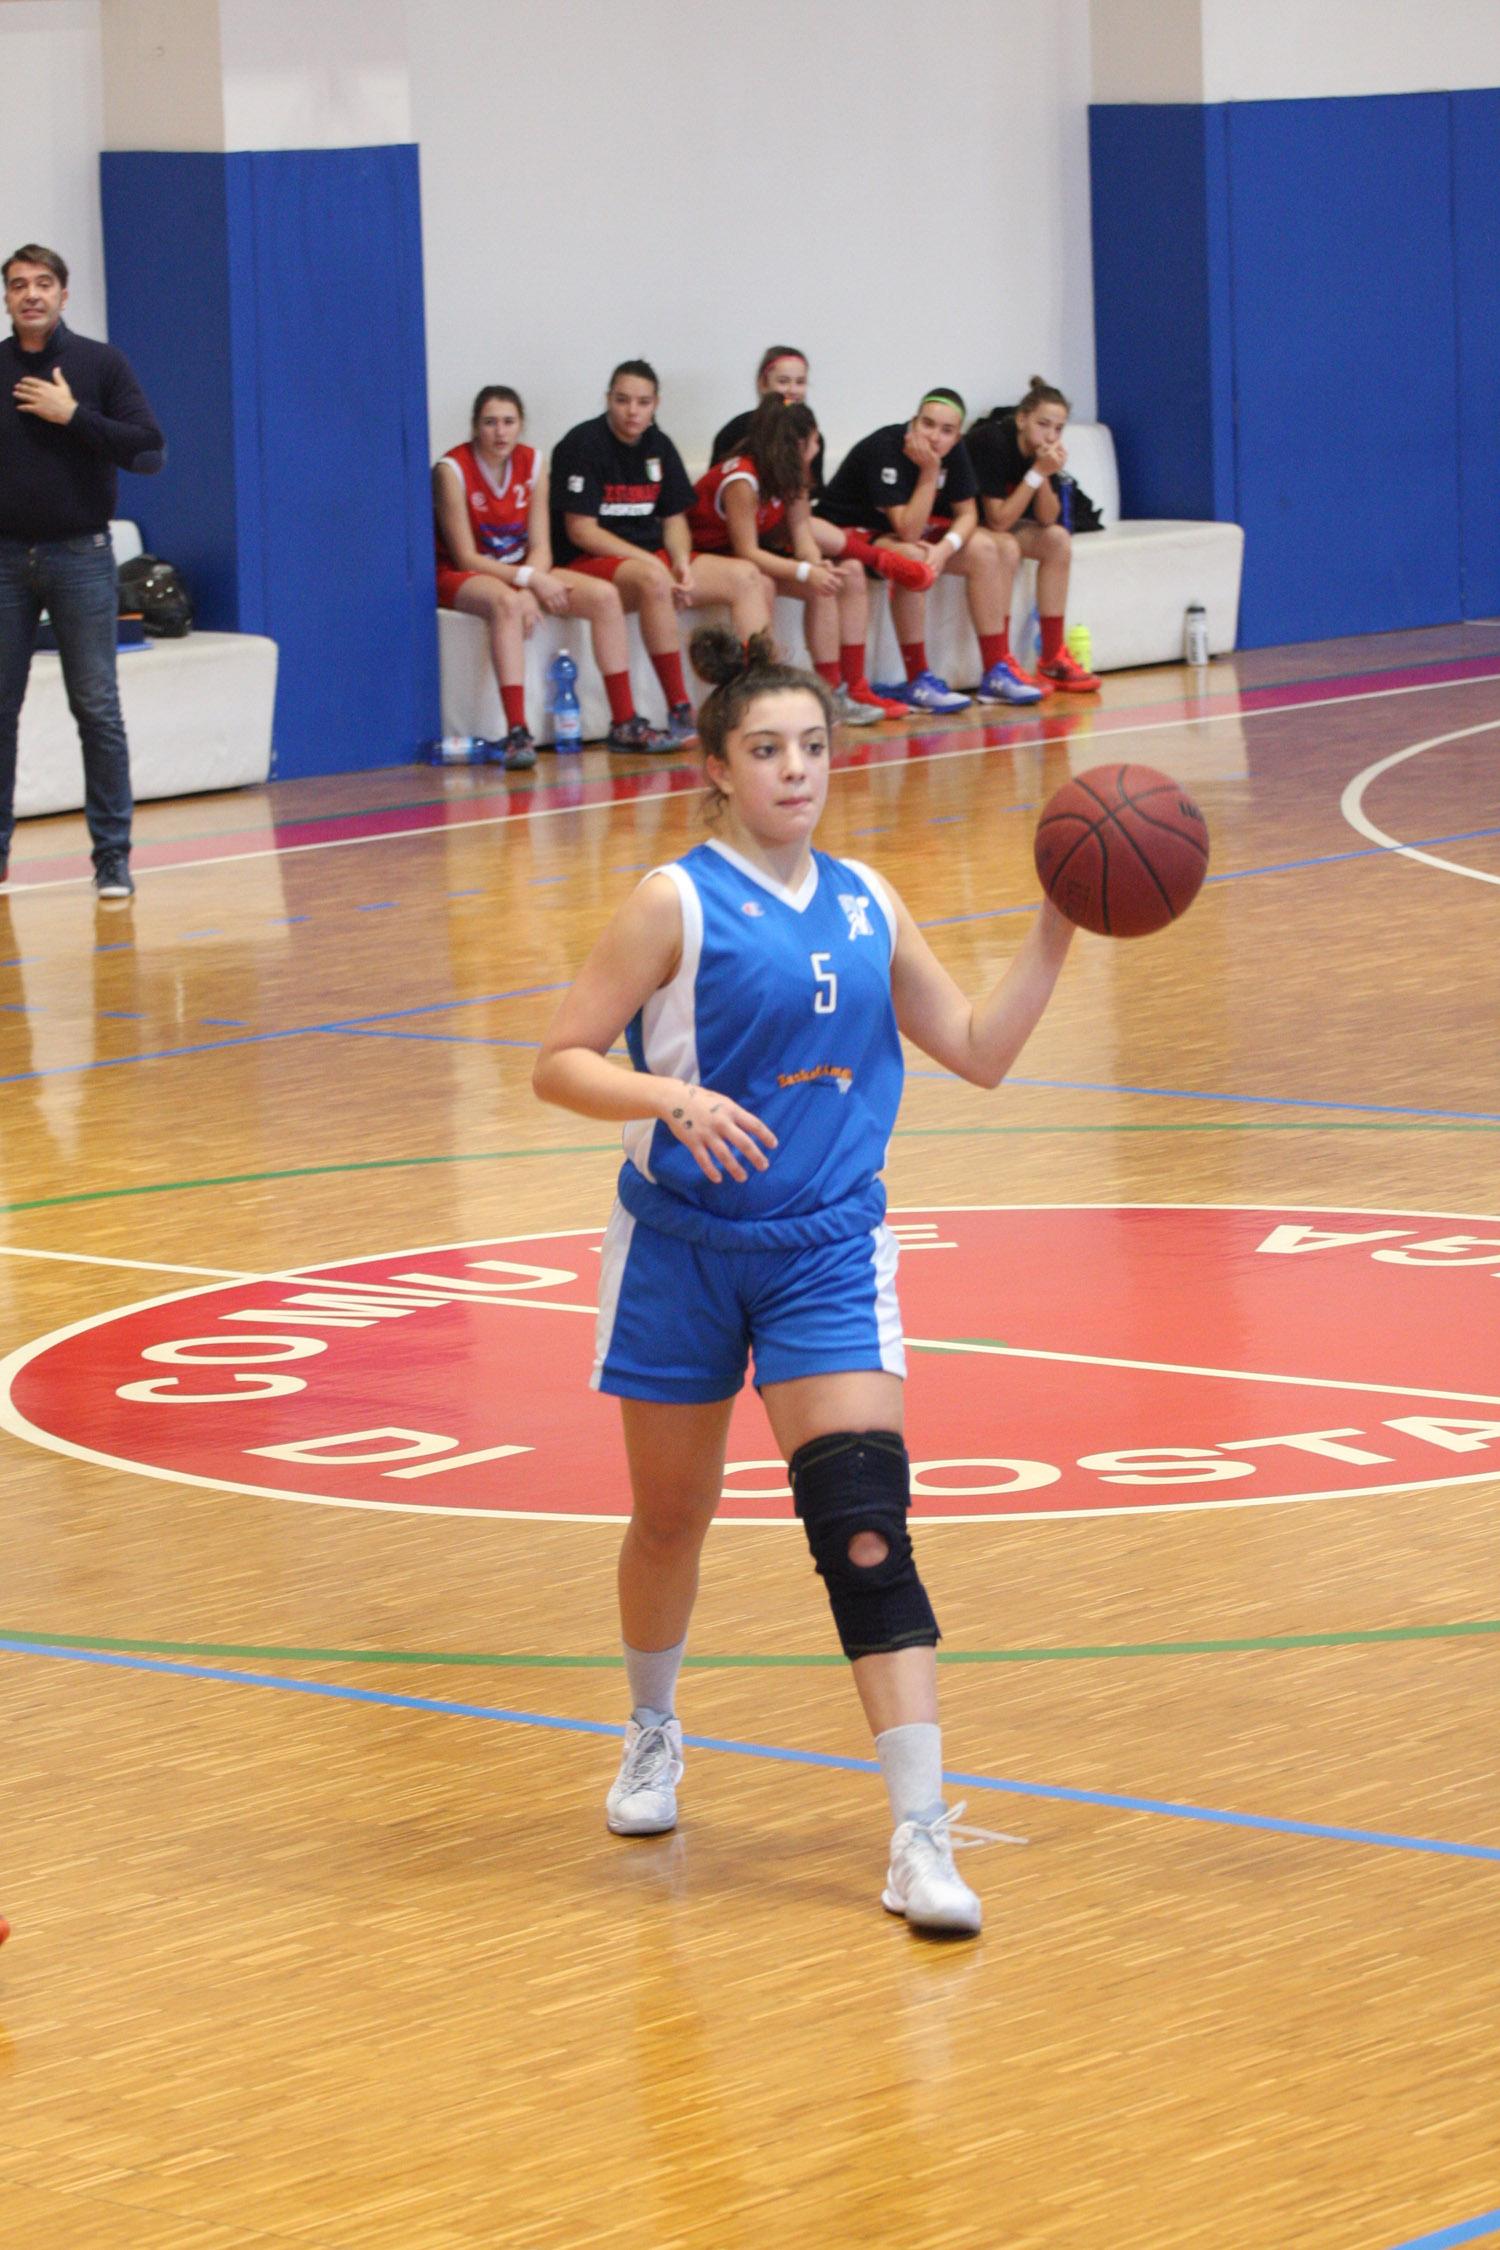 U16E - Costa Masnaga vs Baskettiamo Vittuone 2001 00012.jpg